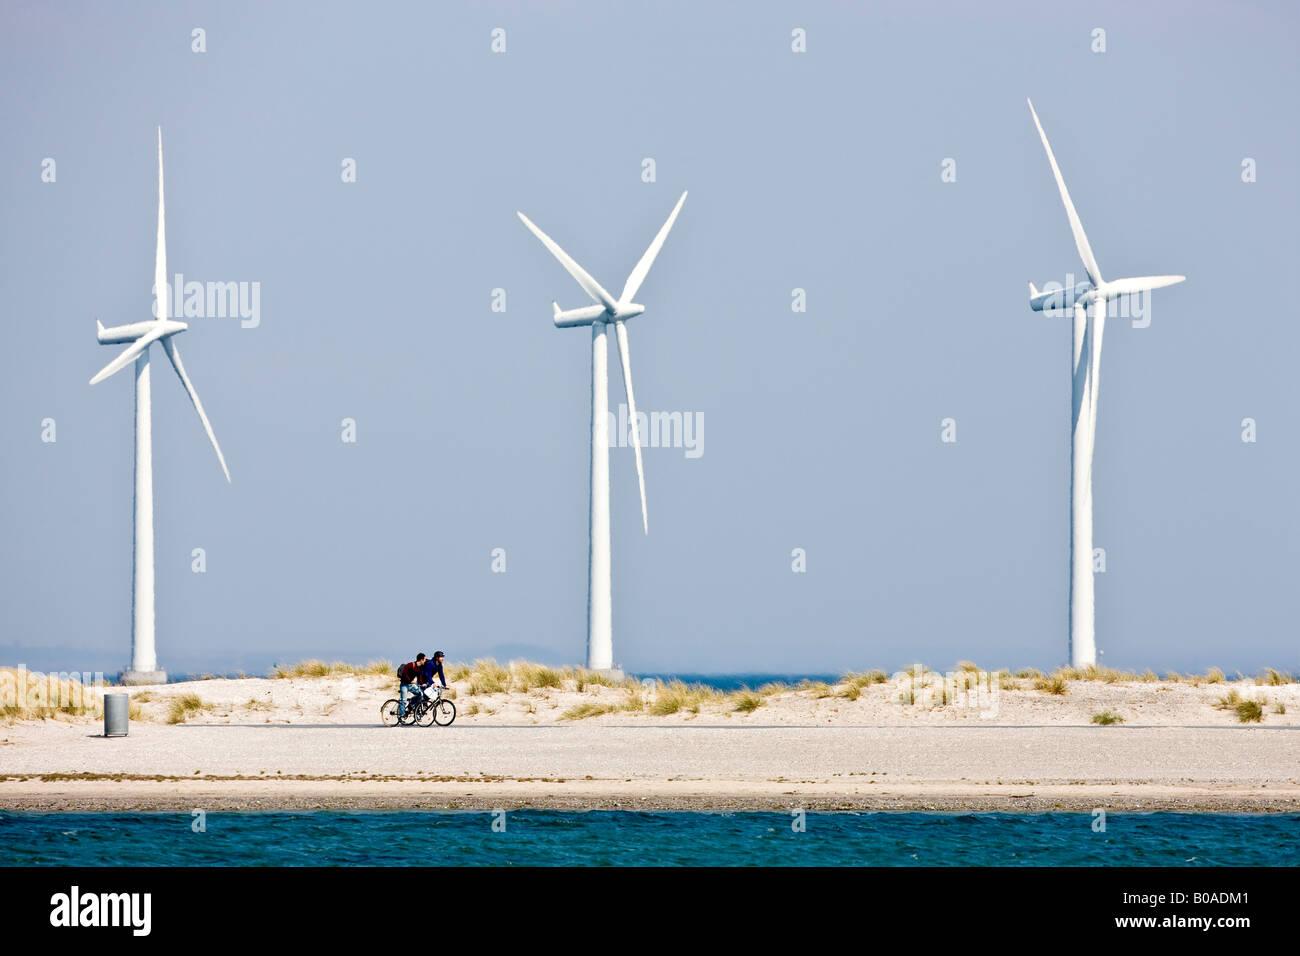 Off-shore Wind Turbines in Denmark - Stock Image